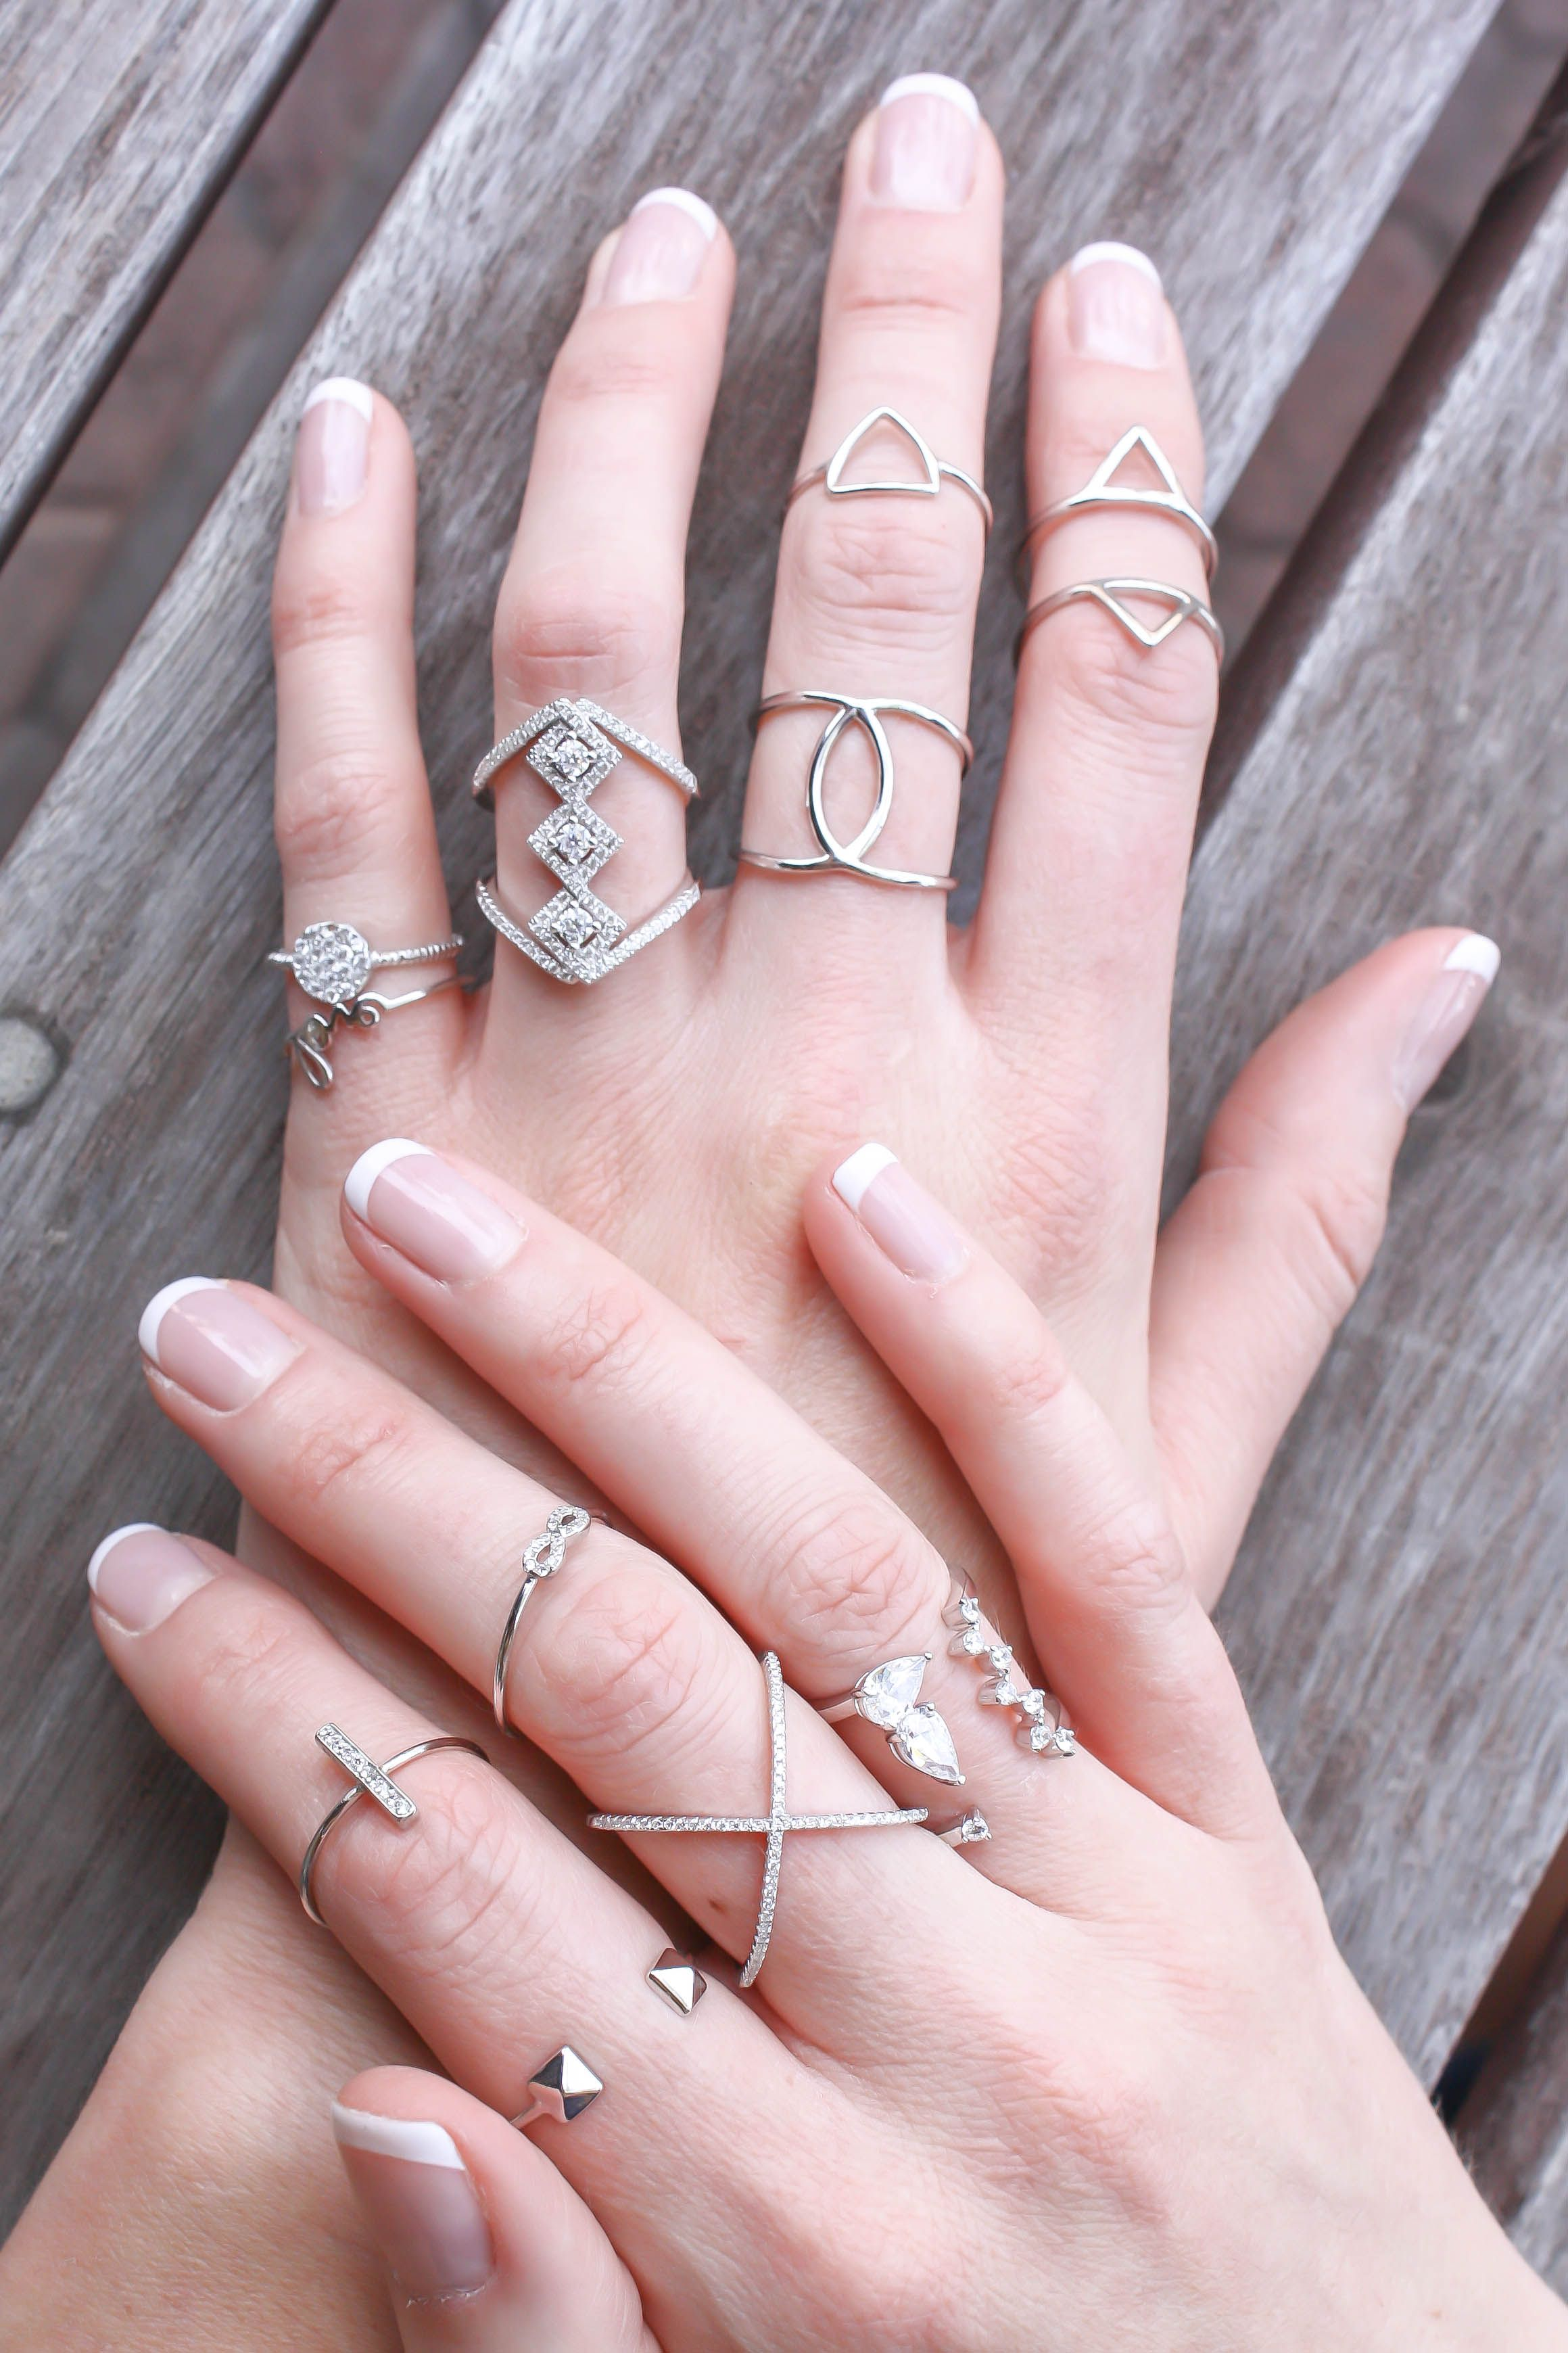 5 piece Gold Rhinestone Midi Rings from Fashion Struck | Jewelry ...